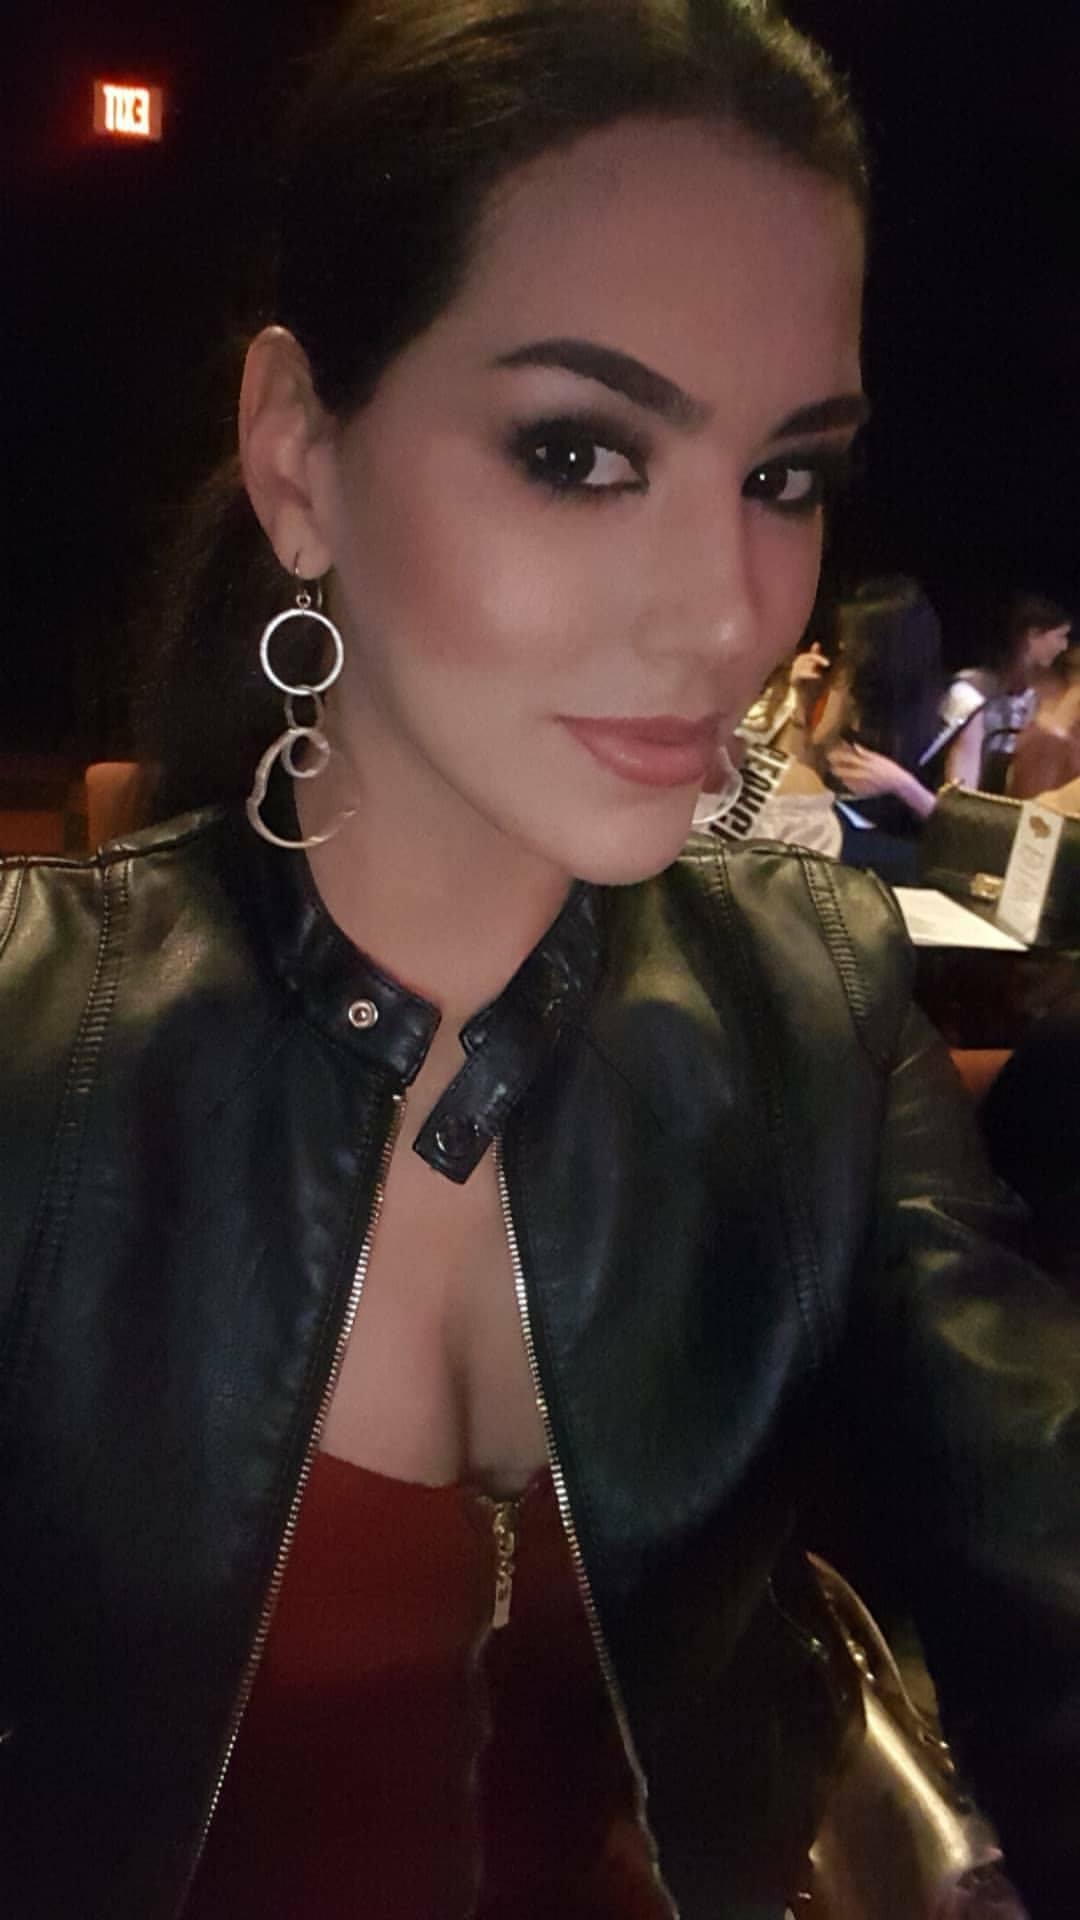 sofia del prado, top 10 de miss universe 2017/reyna hispanoamericana 2015/miss charm spain 2021. - Página 7 56960162_23511029_932373353570120_6503425434288288666_o